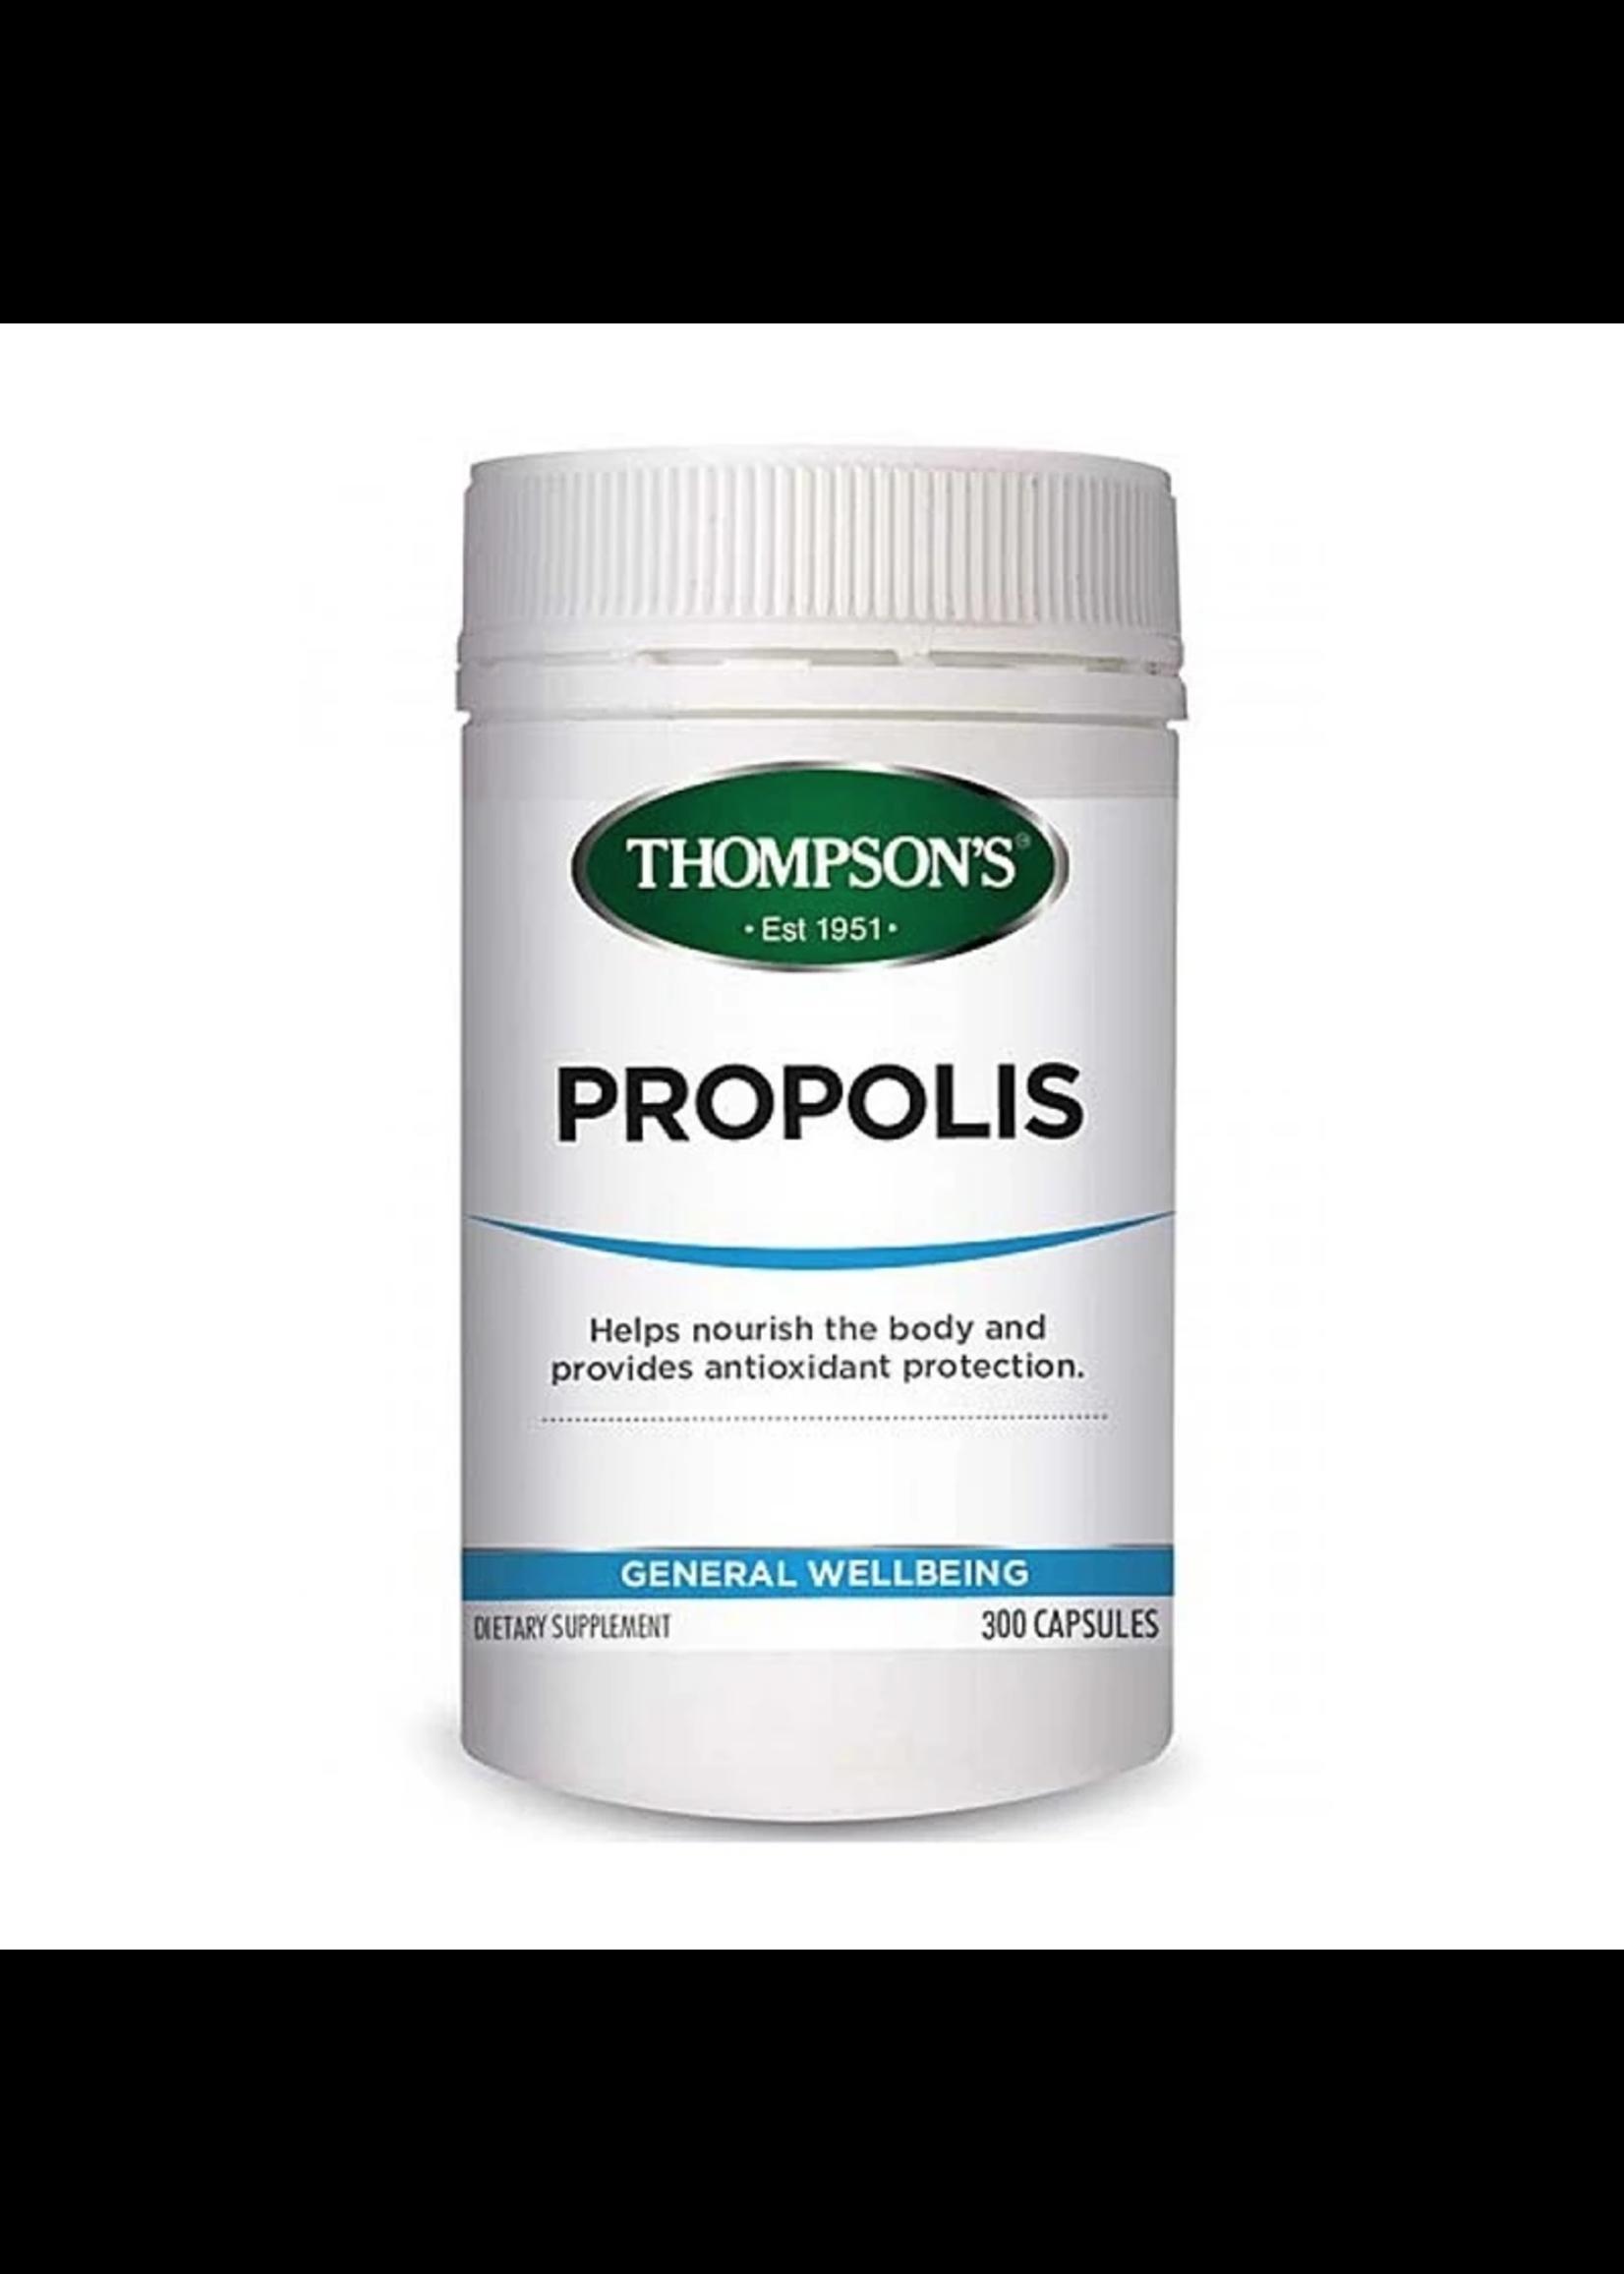 Thompson's Thompson's Propolis 300 caps